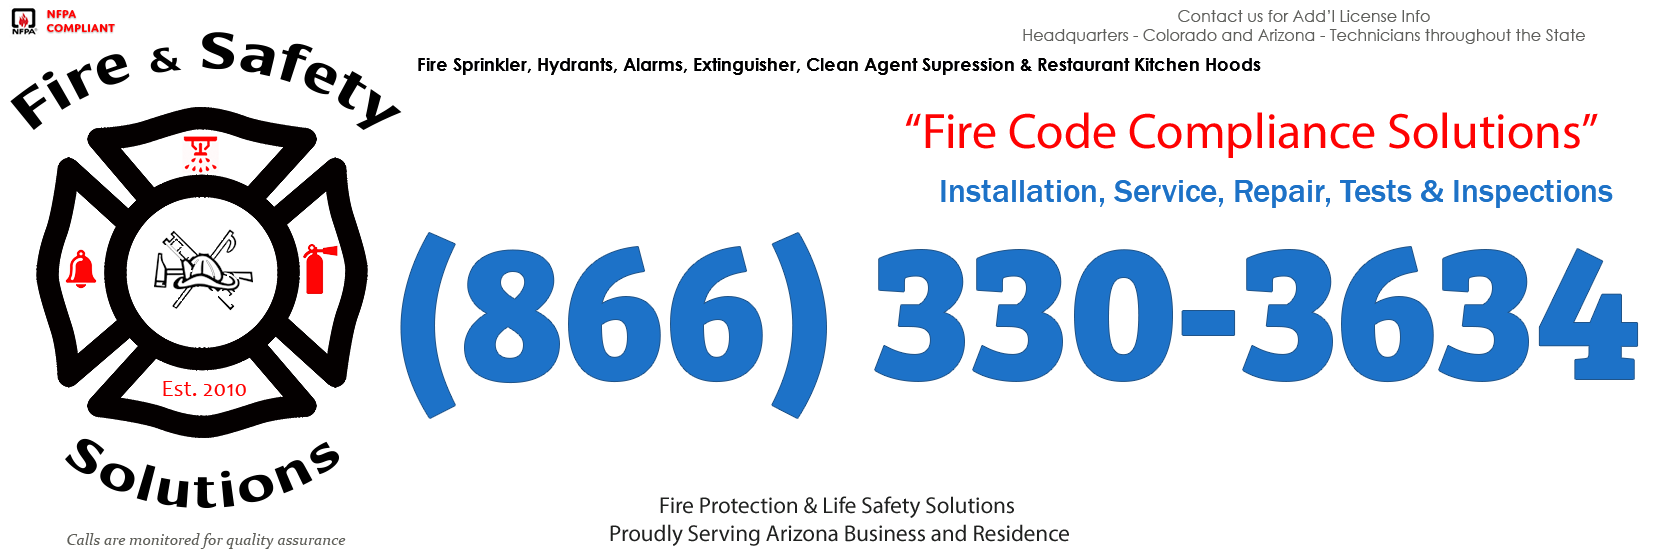 Tucson, Arizona Fire Sprinkler Service Company